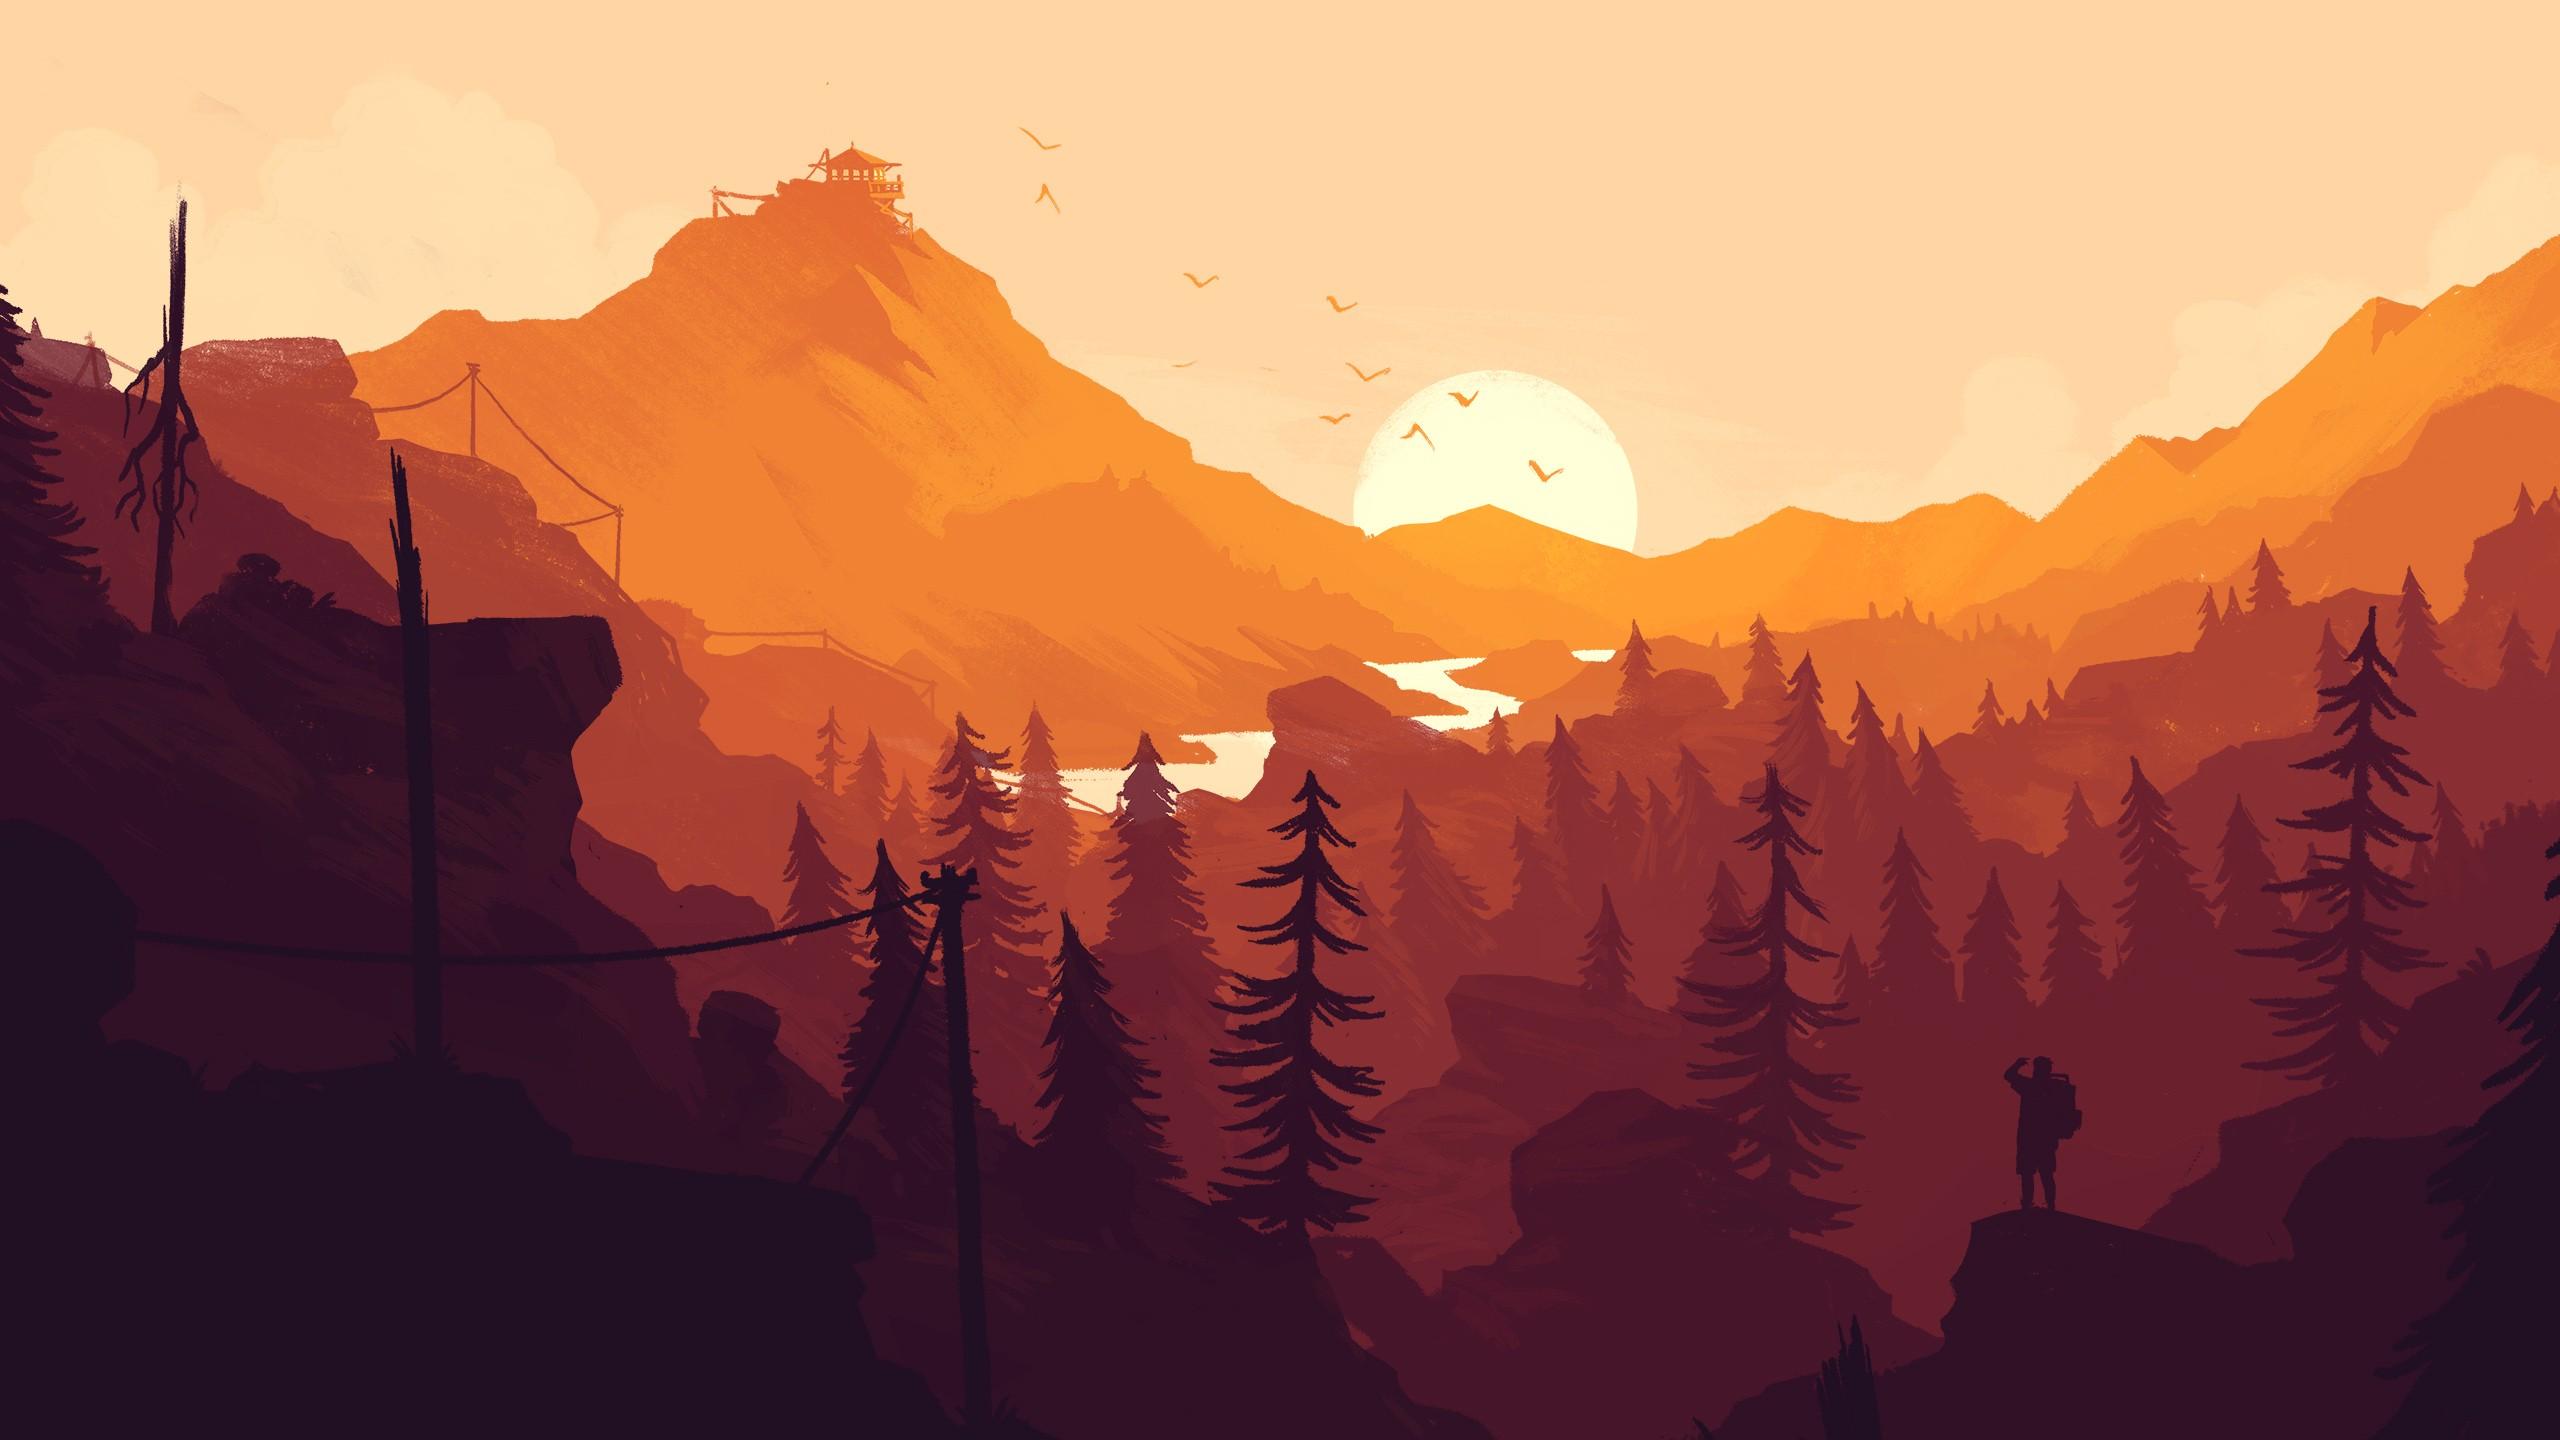 firewatch hd wallpaper,sky,mountainous landforms,nature,mountain,mountain range